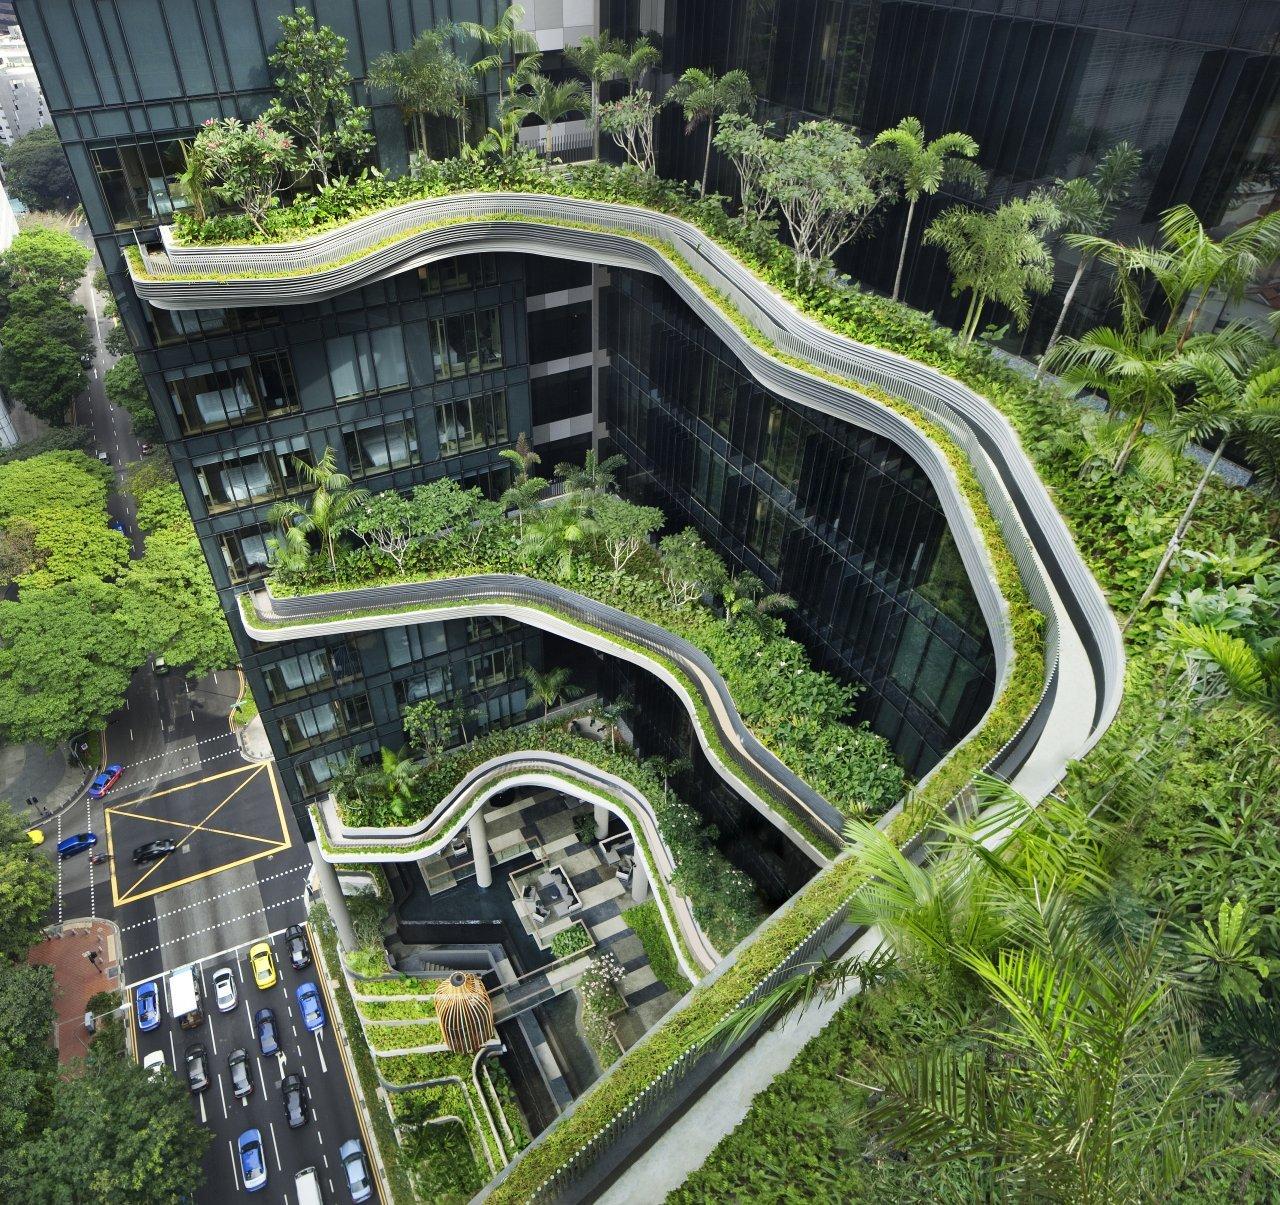 Ogród w centrum miasta 1